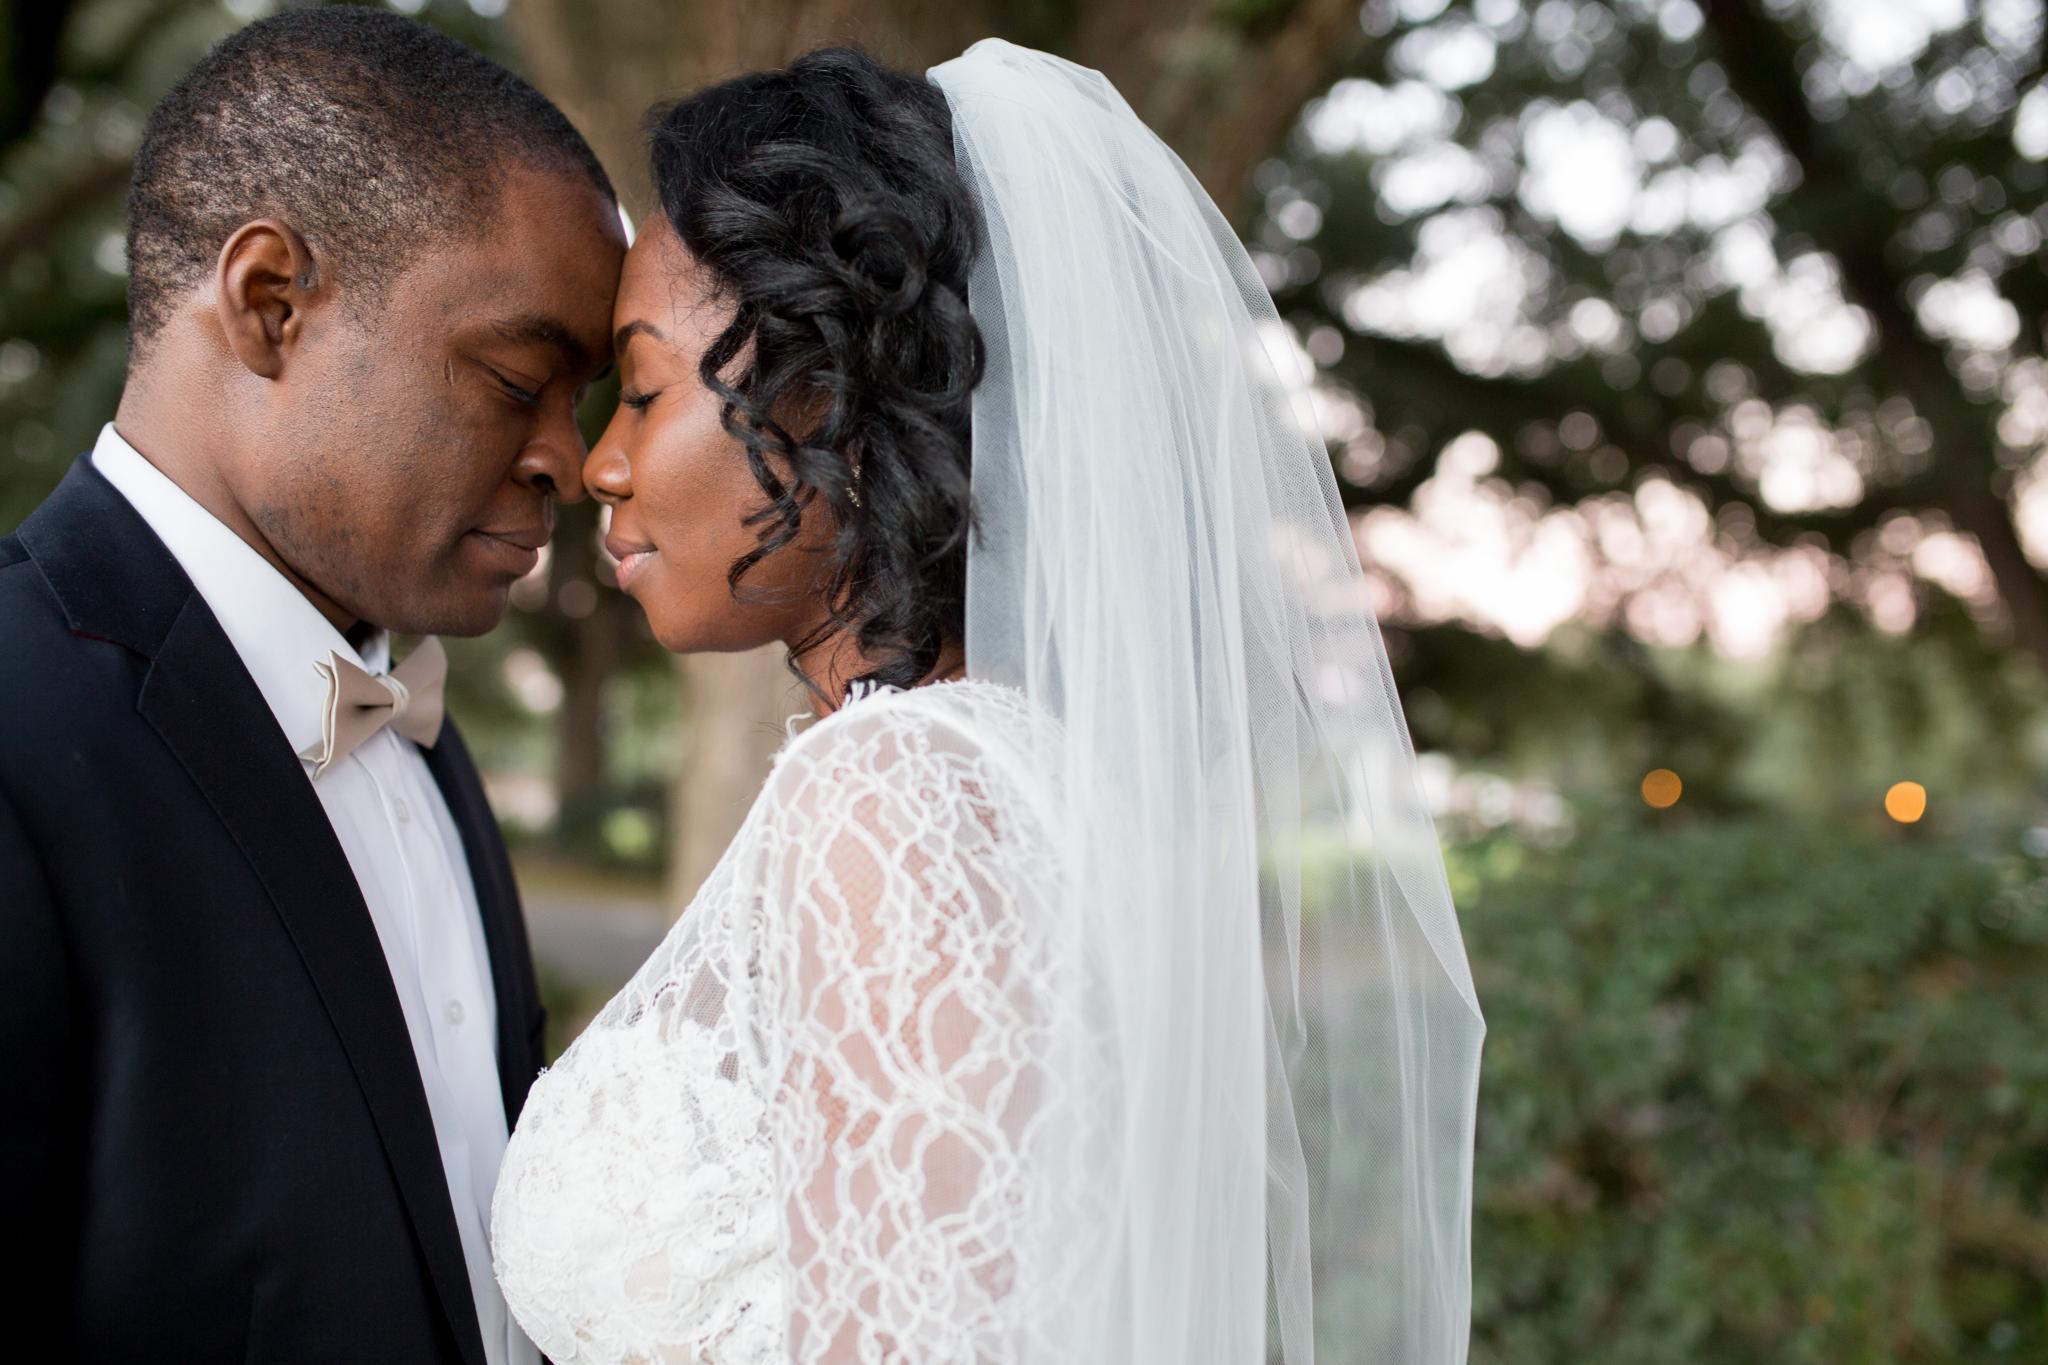 Bridal Bliss: Danielle and Ademola's Alabama Wedding